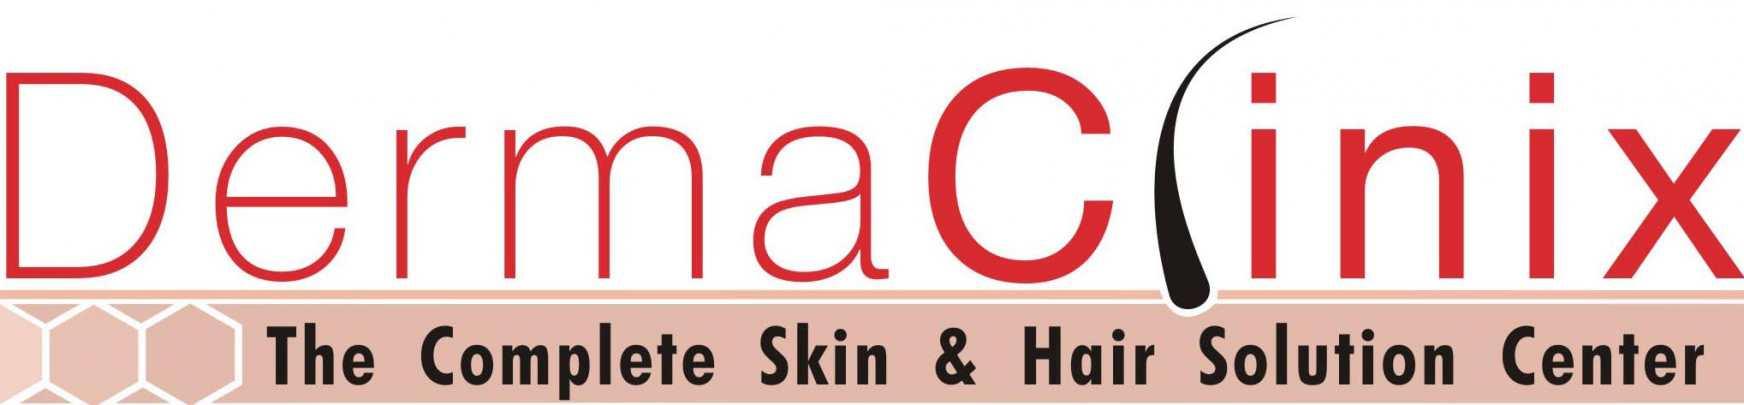 Dermaclinix The Complete Skin& Hair SolutionCenter Logo